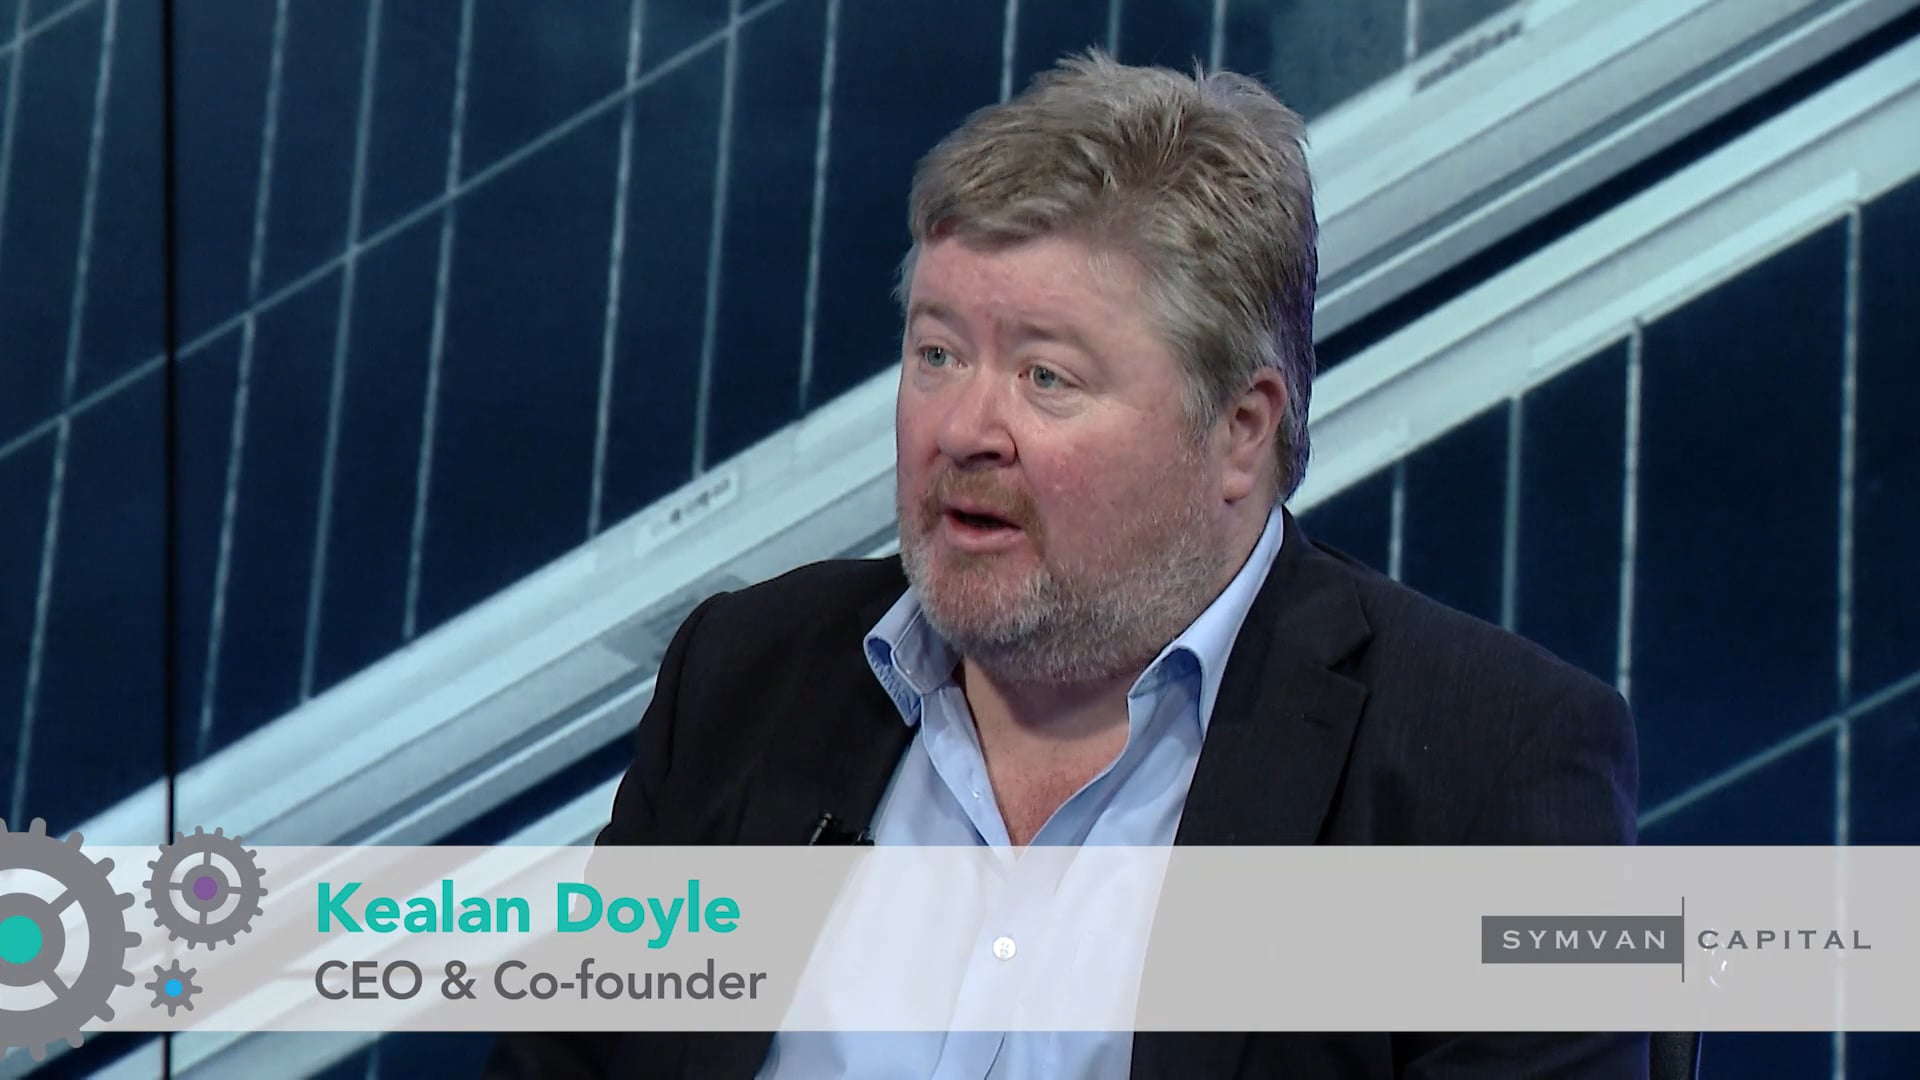 EIS Showcase: Interview with Kealan Doyle from Symvan Capital